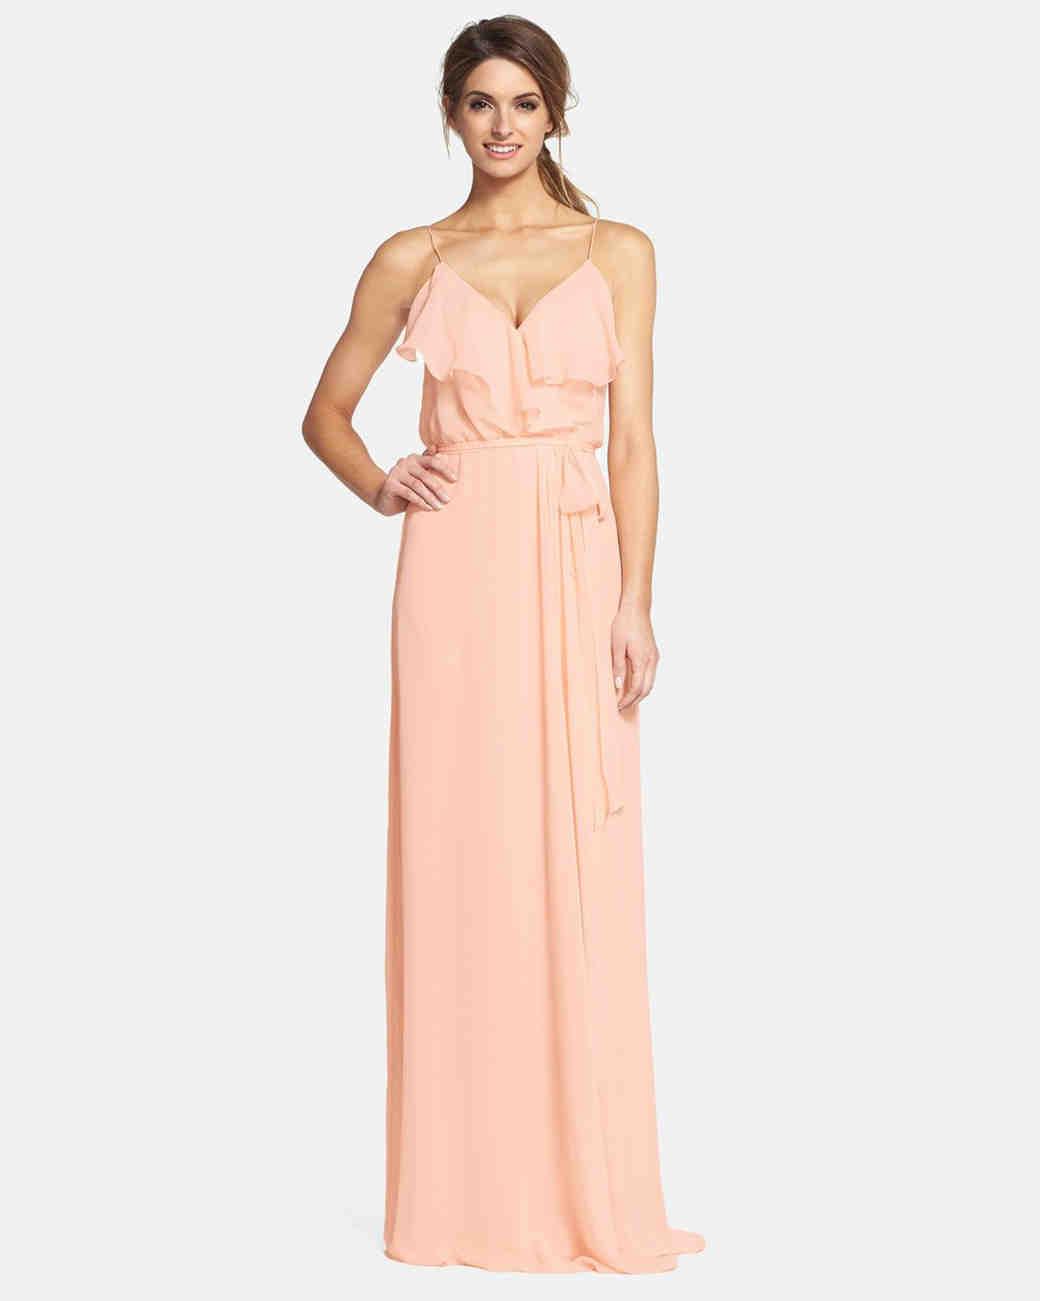 Spaghetti strap bridesmaid dresses martha stewart weddings ombrellifo Gallery